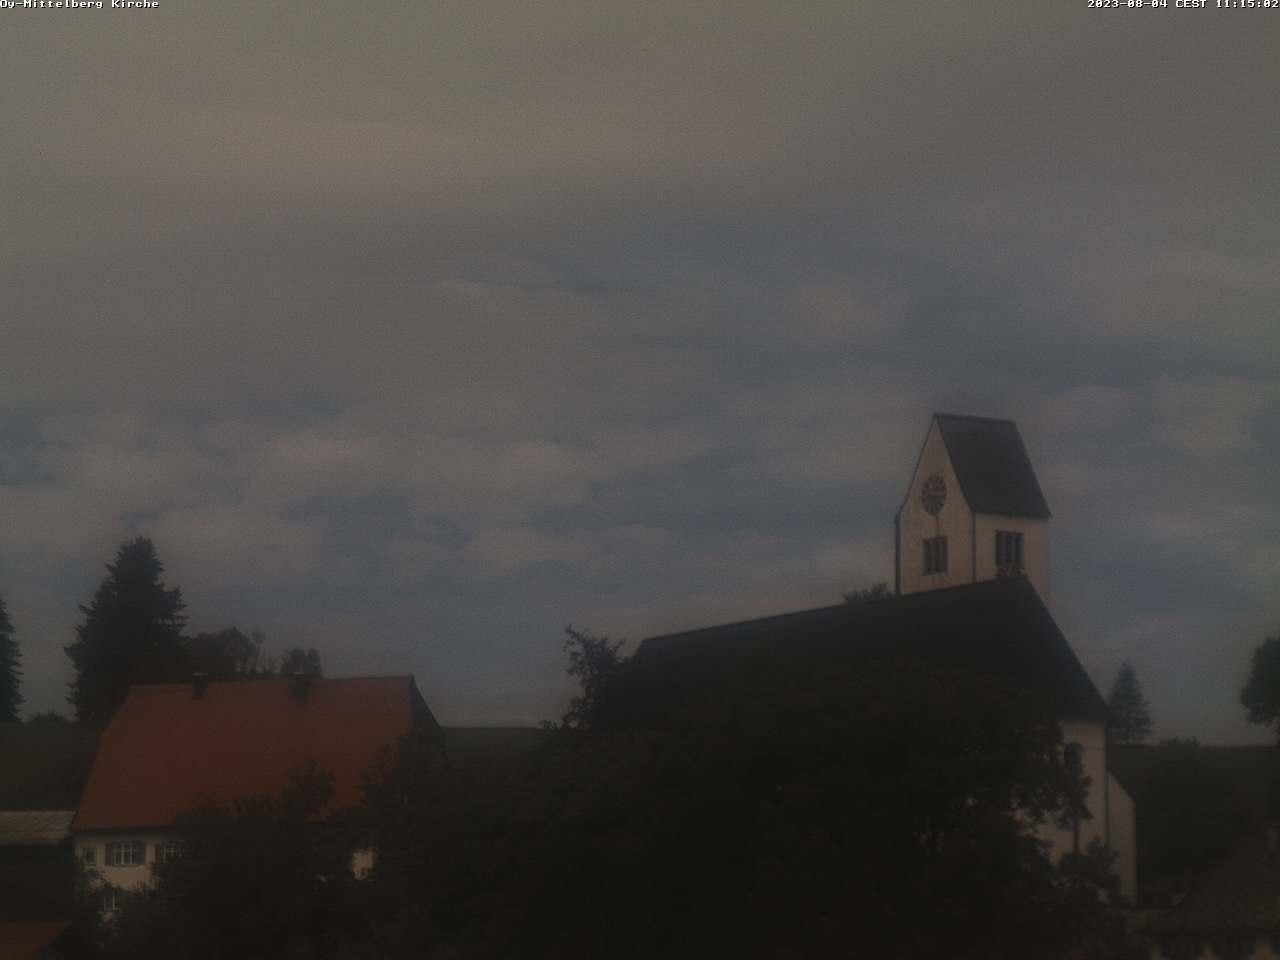 Mittelberg Kirche Webcam